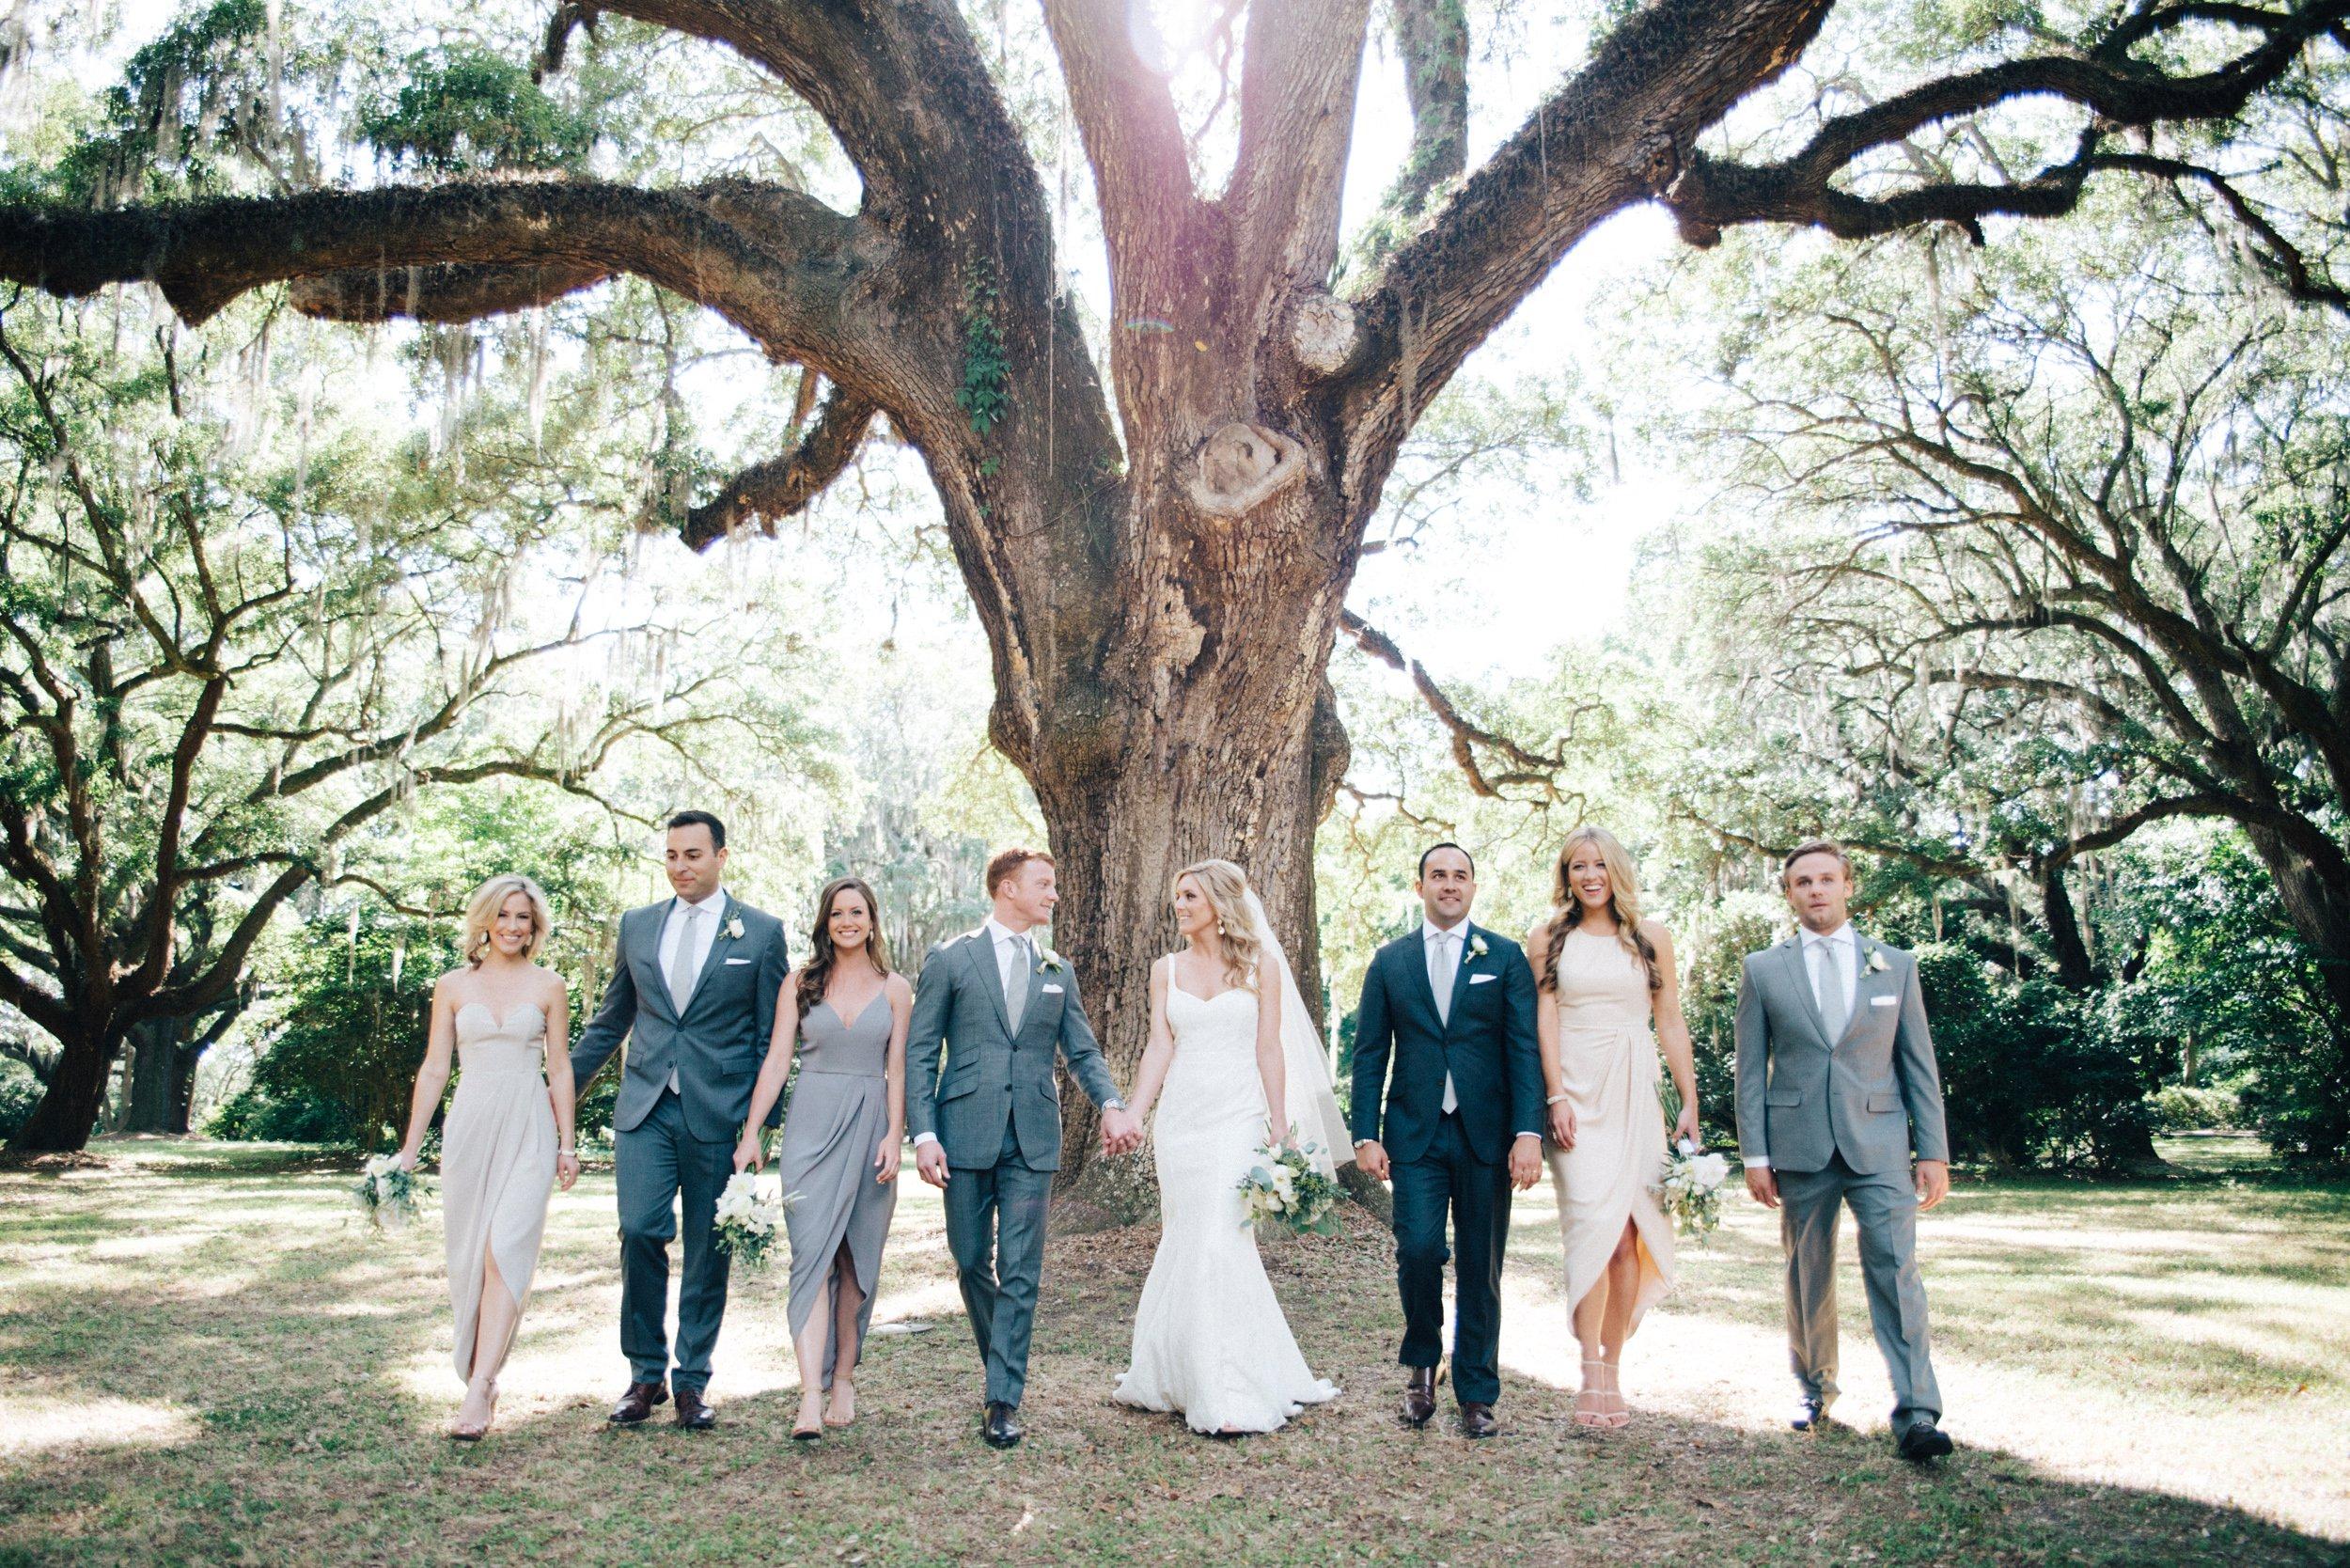 legare-waring-house-wedding-17.jpg